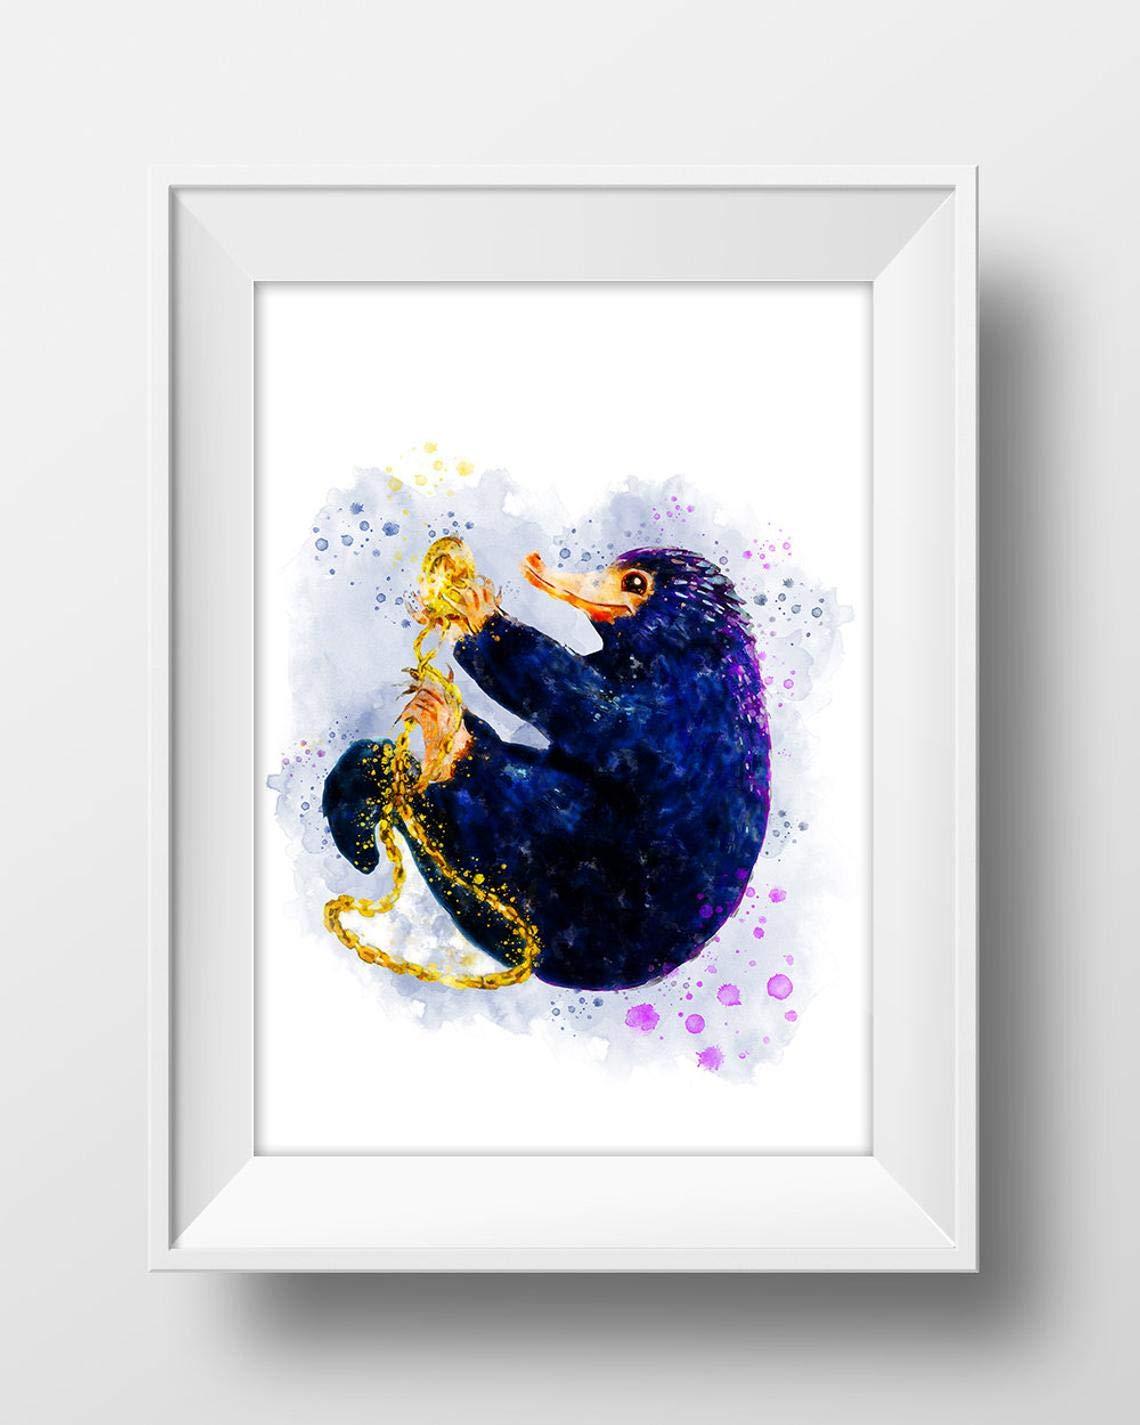 Fantastic Beasts Watercolour Print